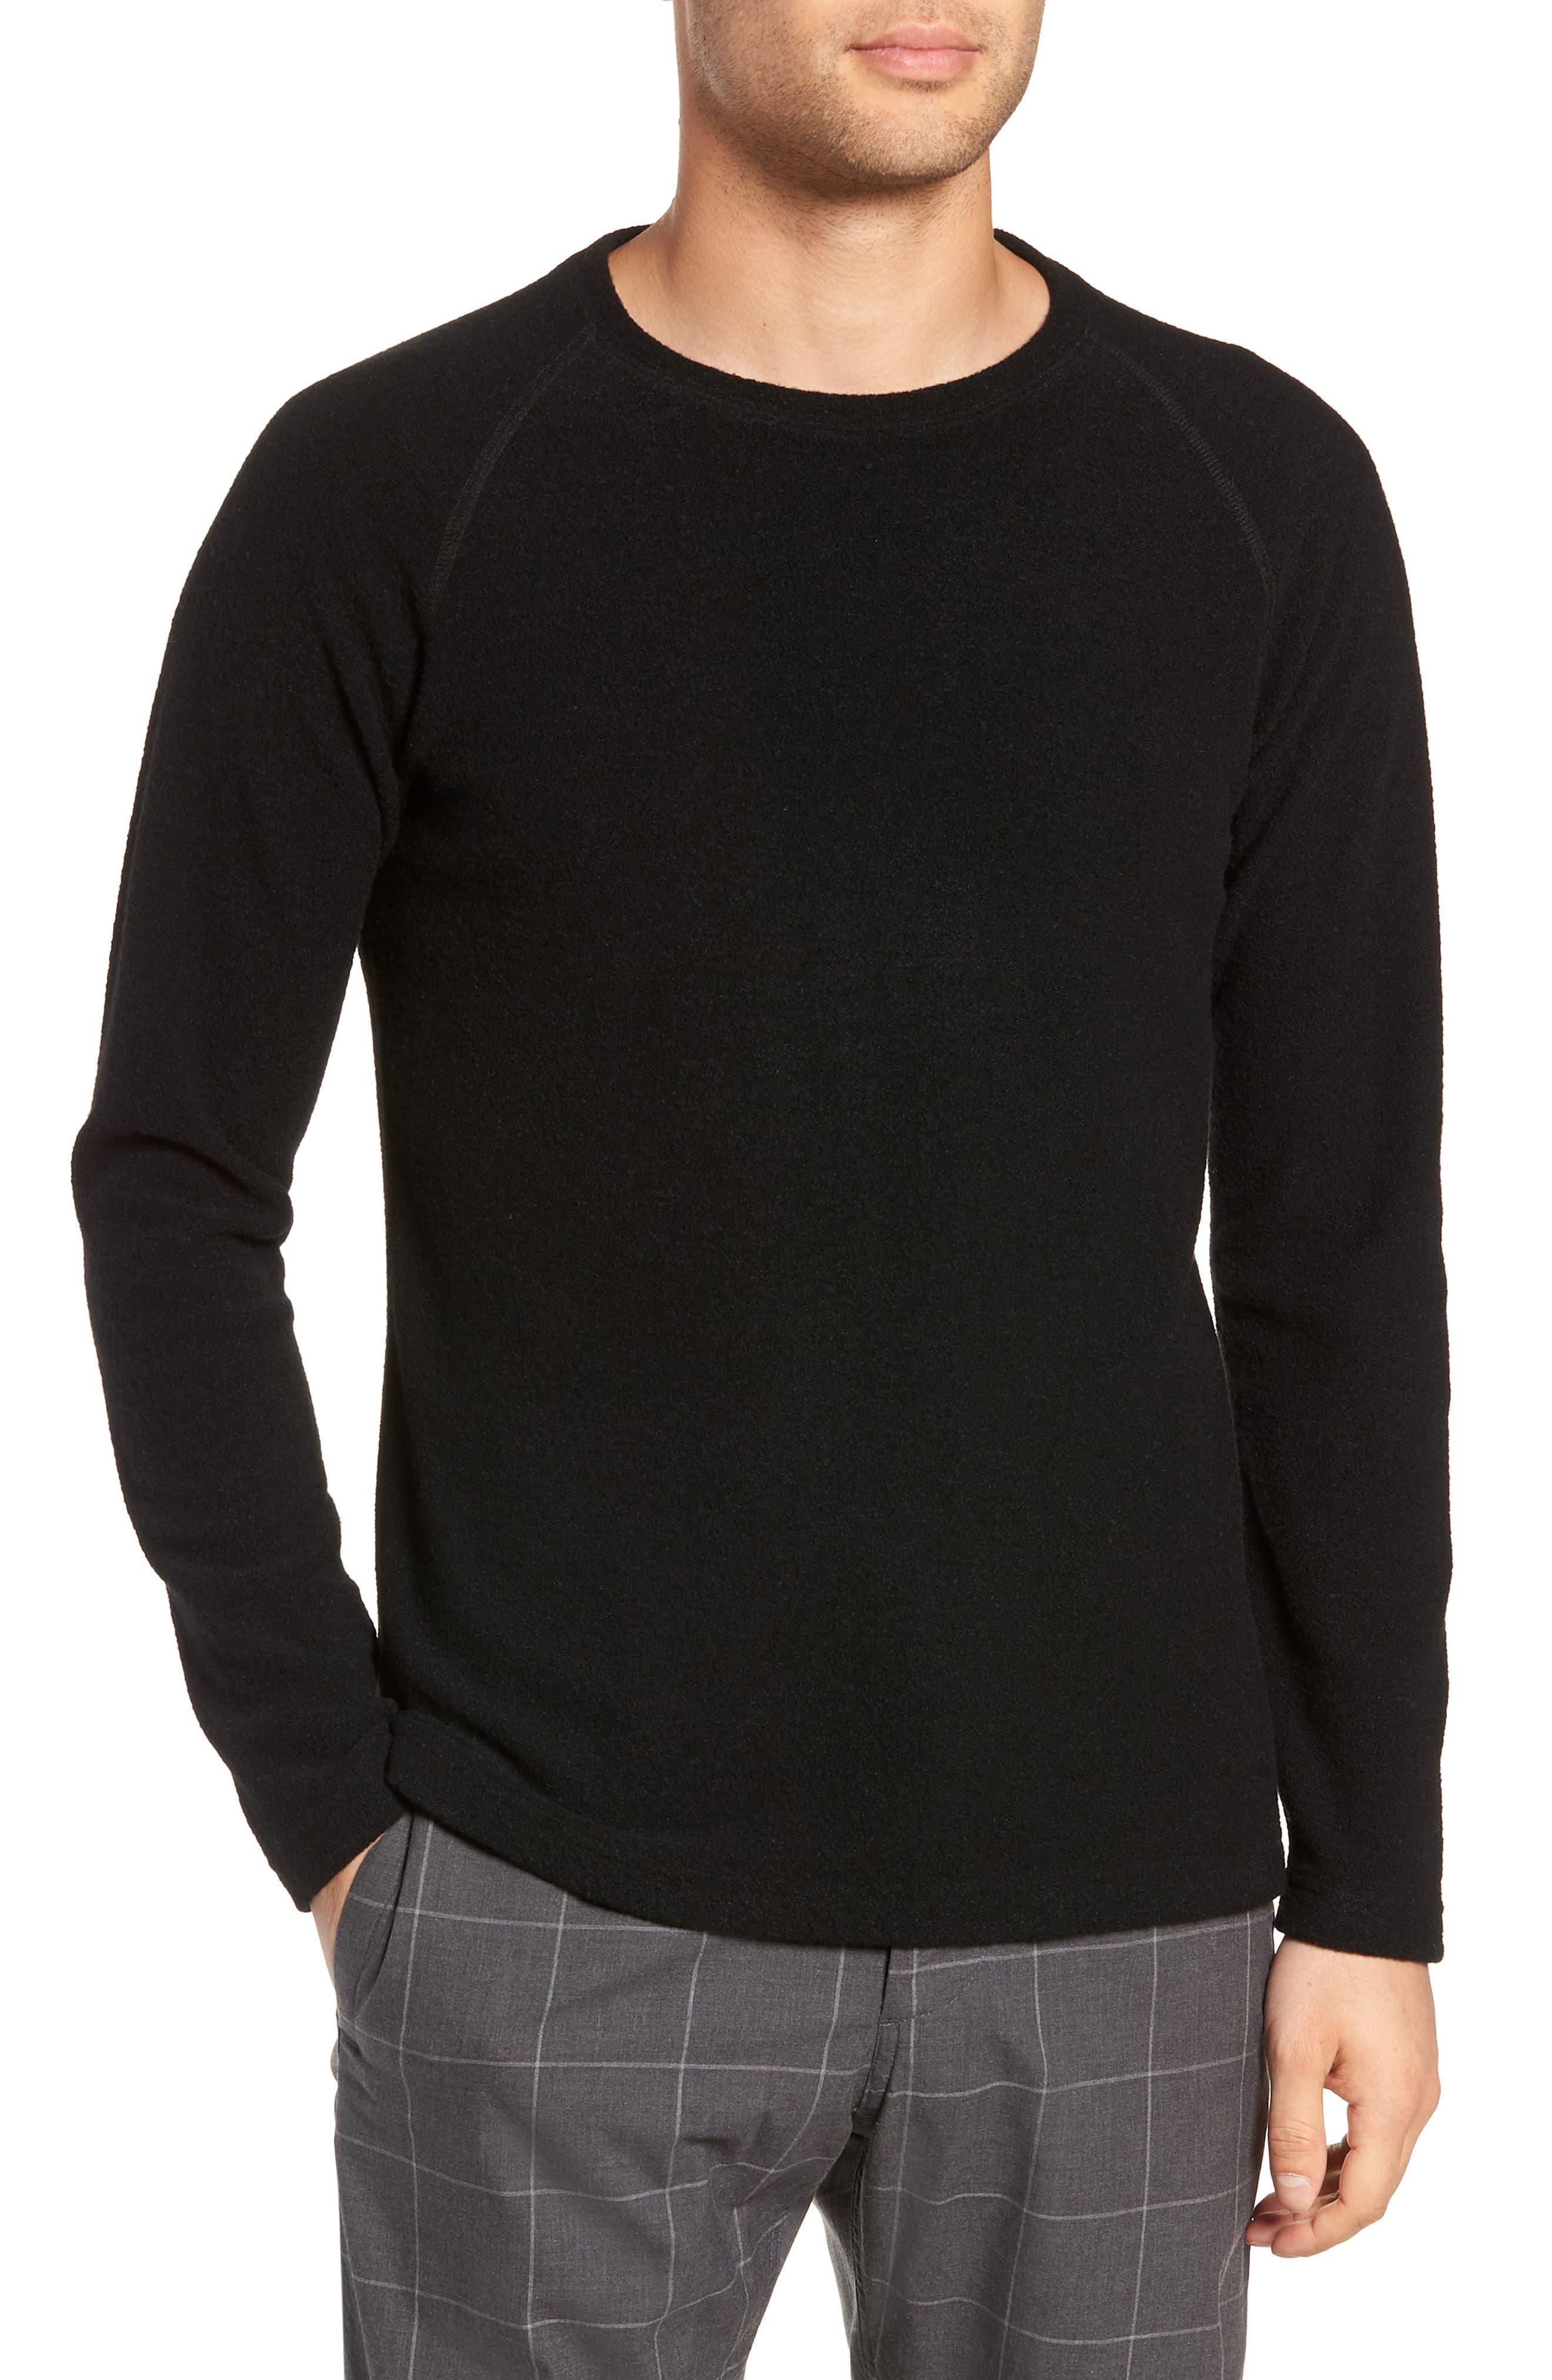 Wings + Horns Felted Wool Sweater, Black